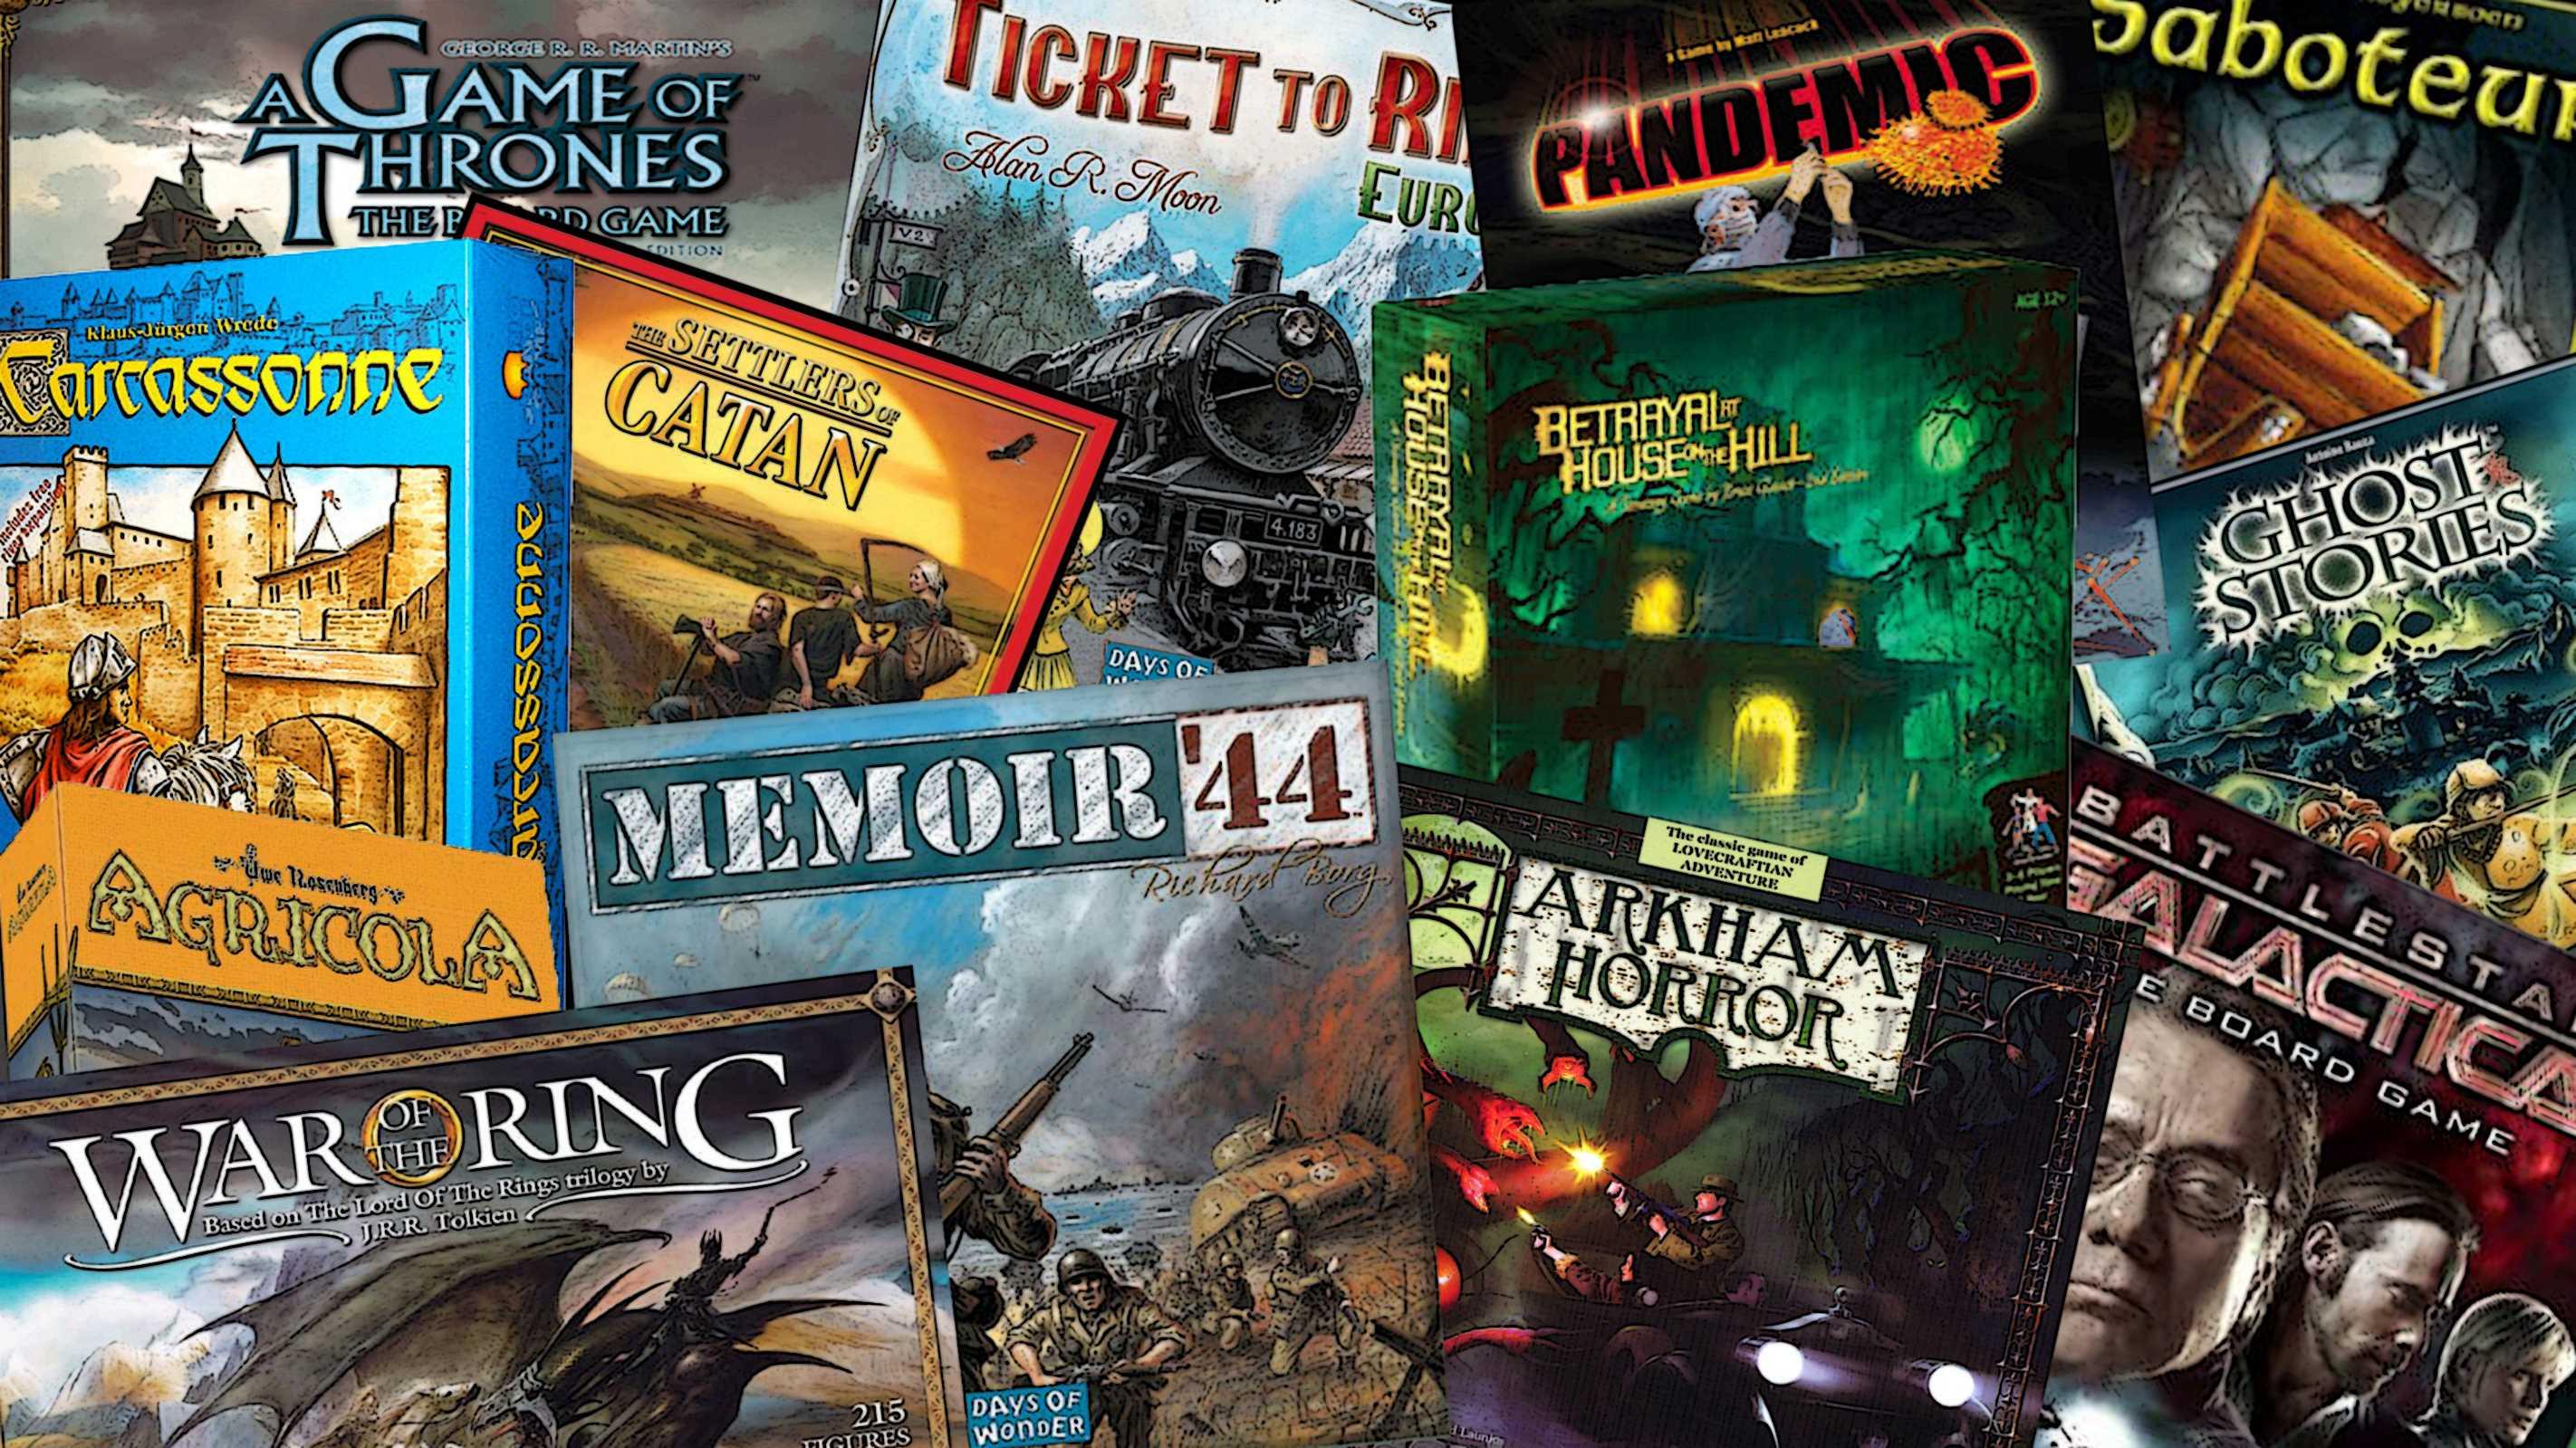 Top 10 Co-op Games of 2015 - O8O8